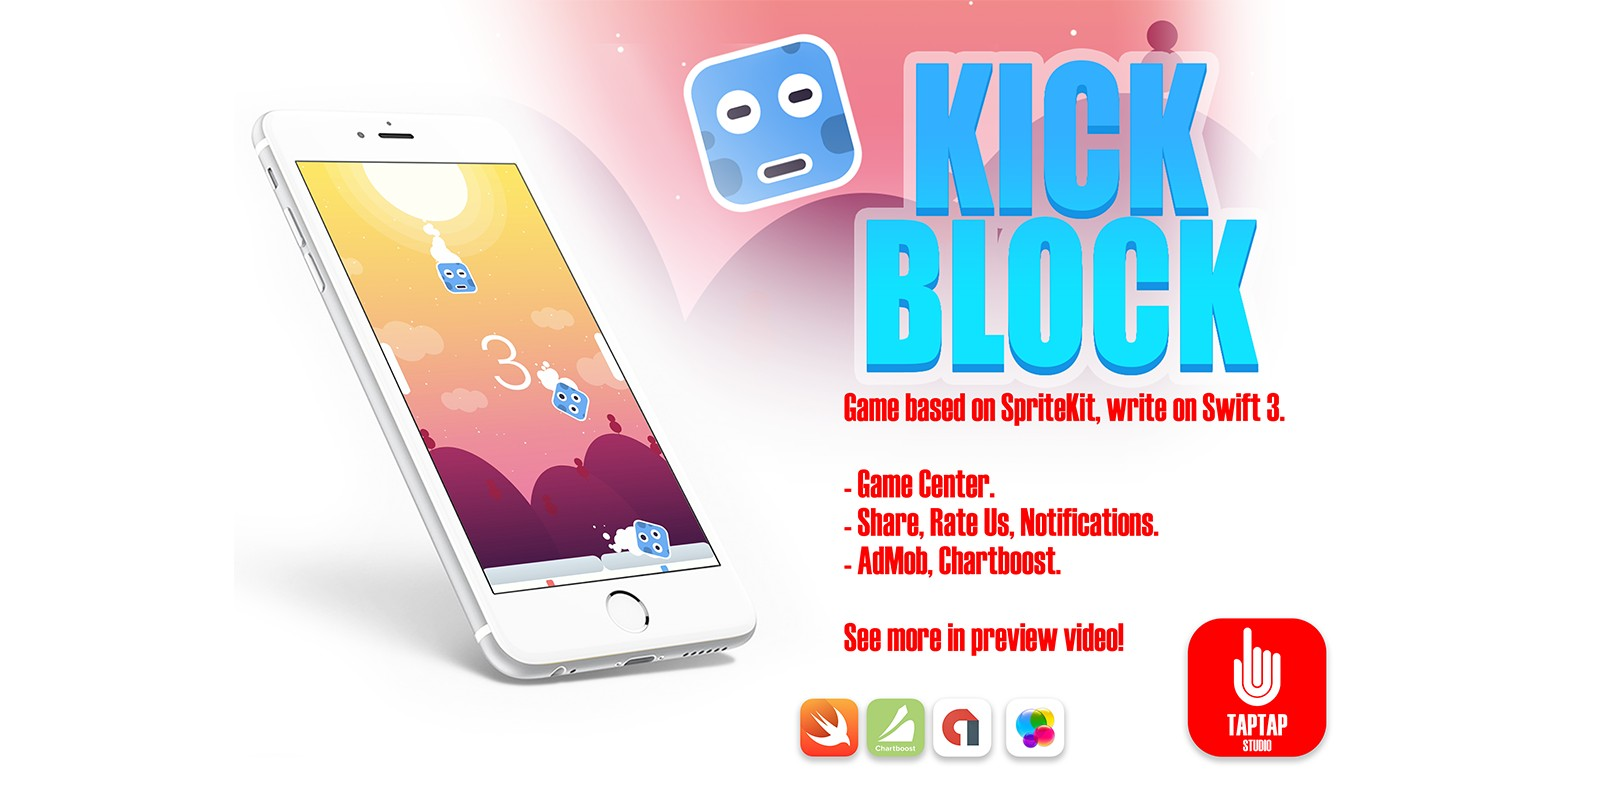 Kick Block - iOS Xcode Source Code